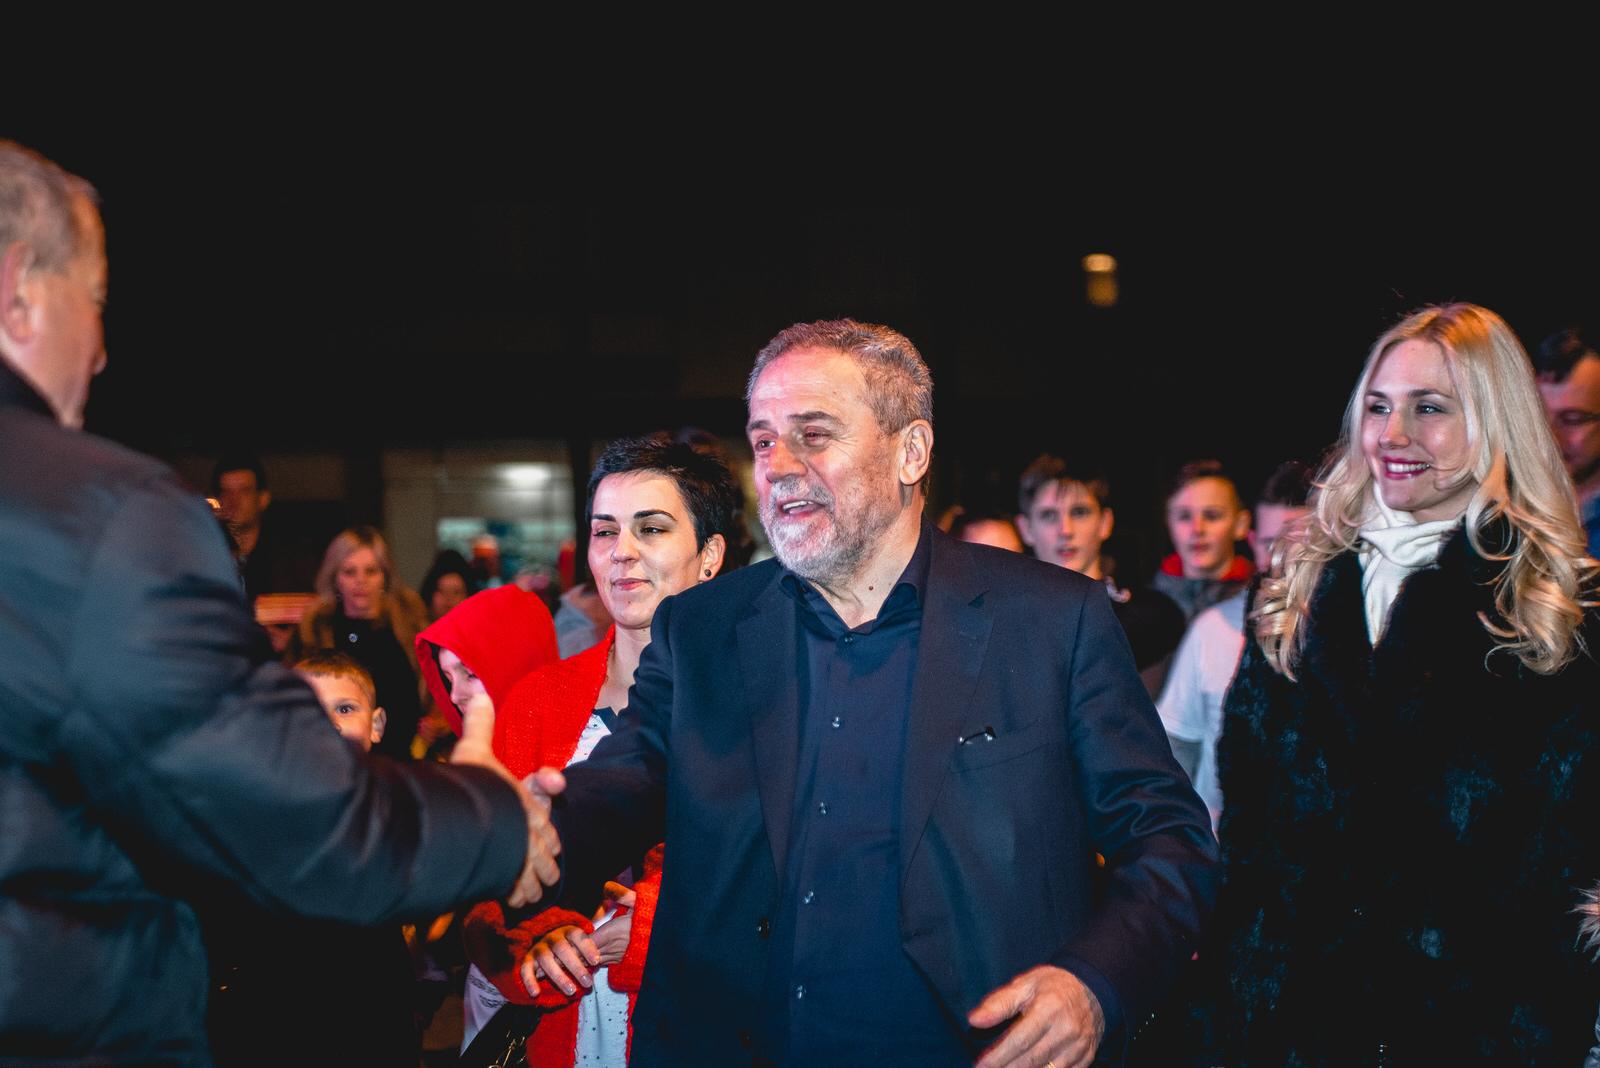 likaclub_milan-bandić-lički-osik_2019-11